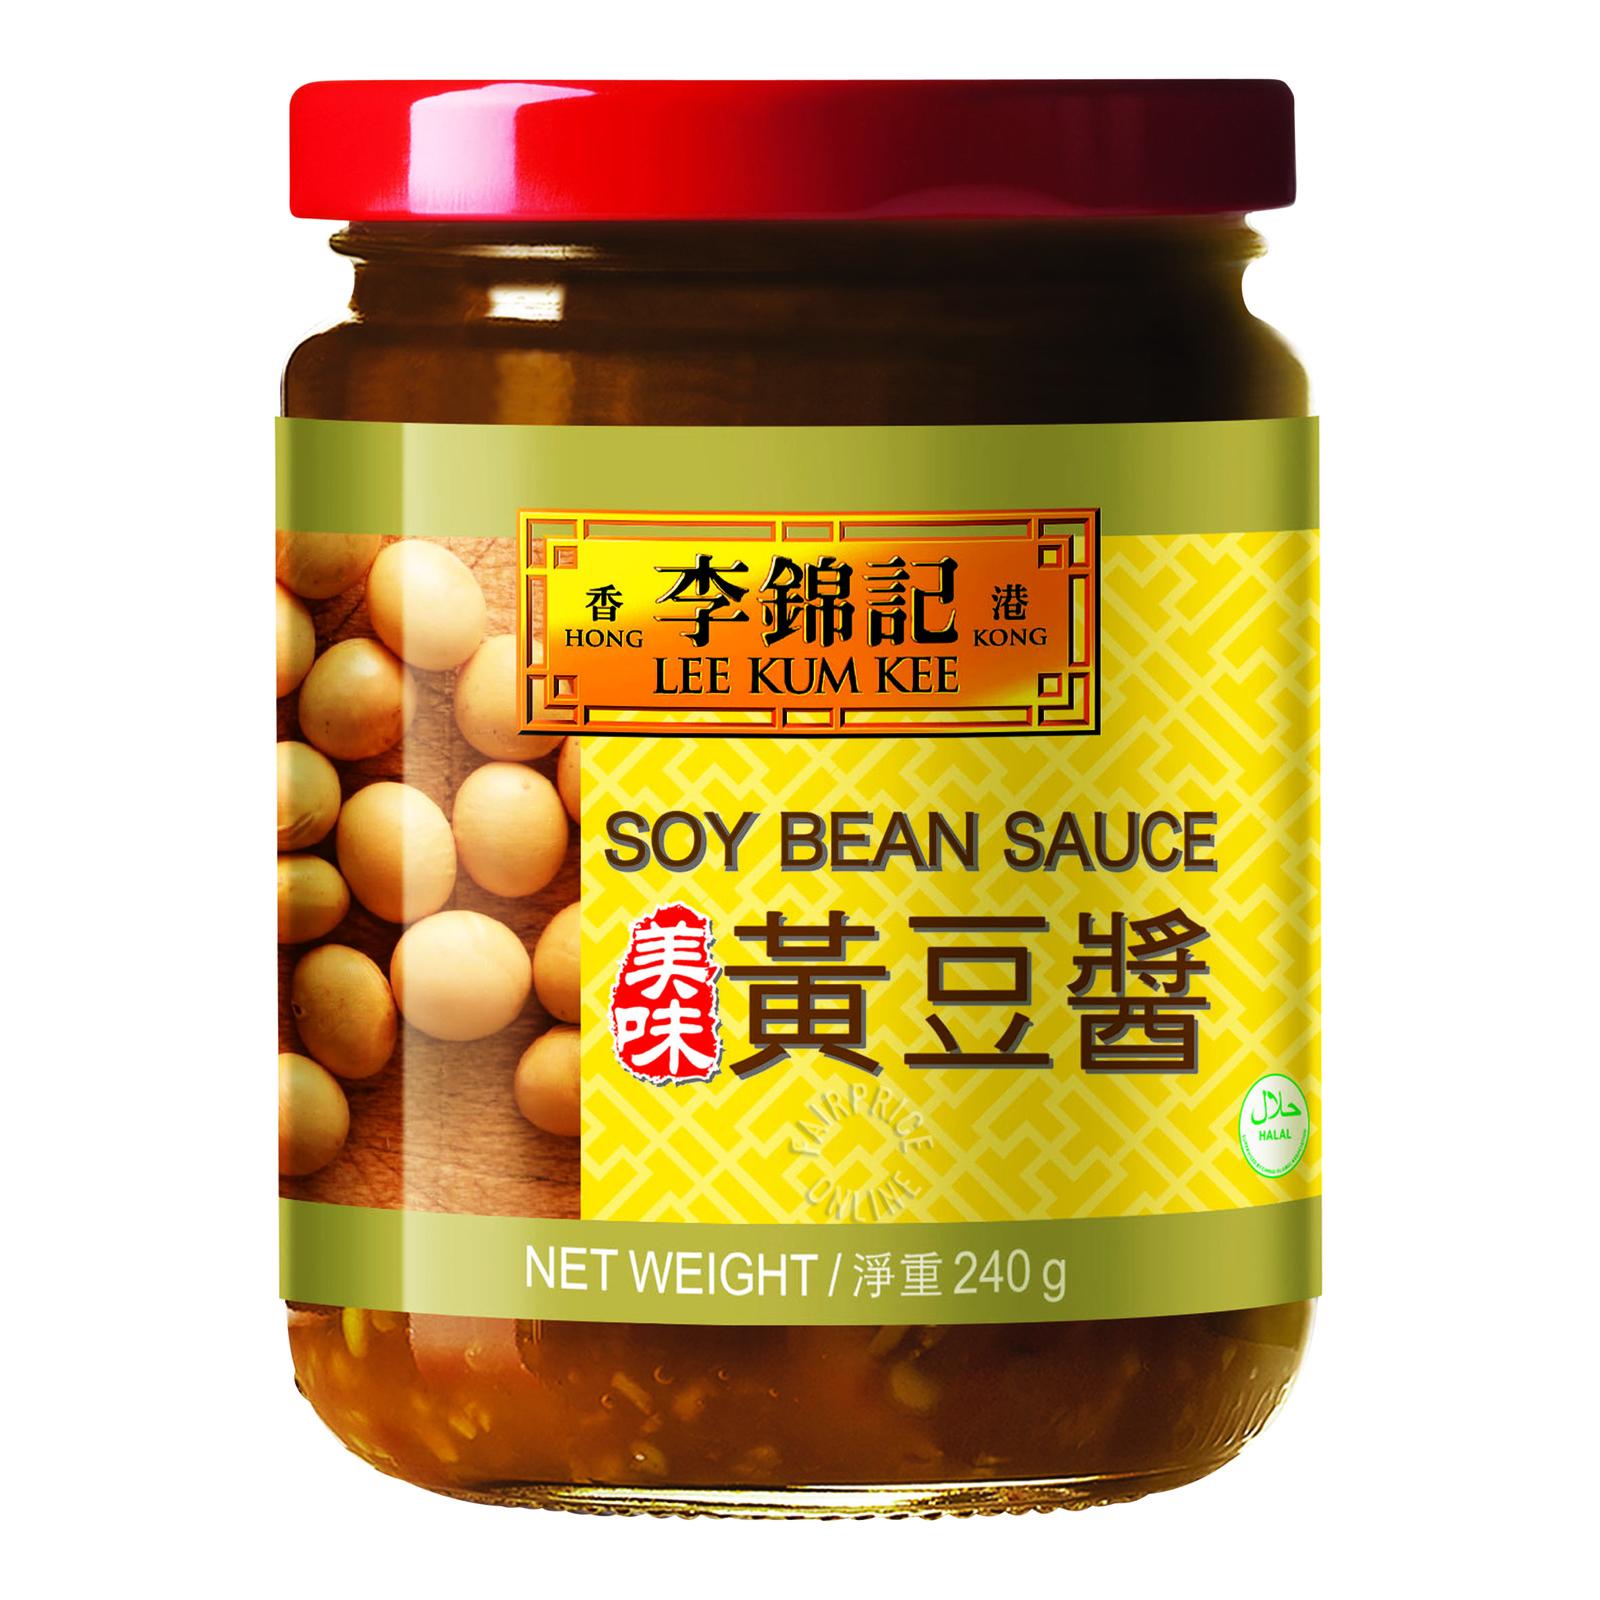 Lee Kum Kee Sauce - Soy Bean